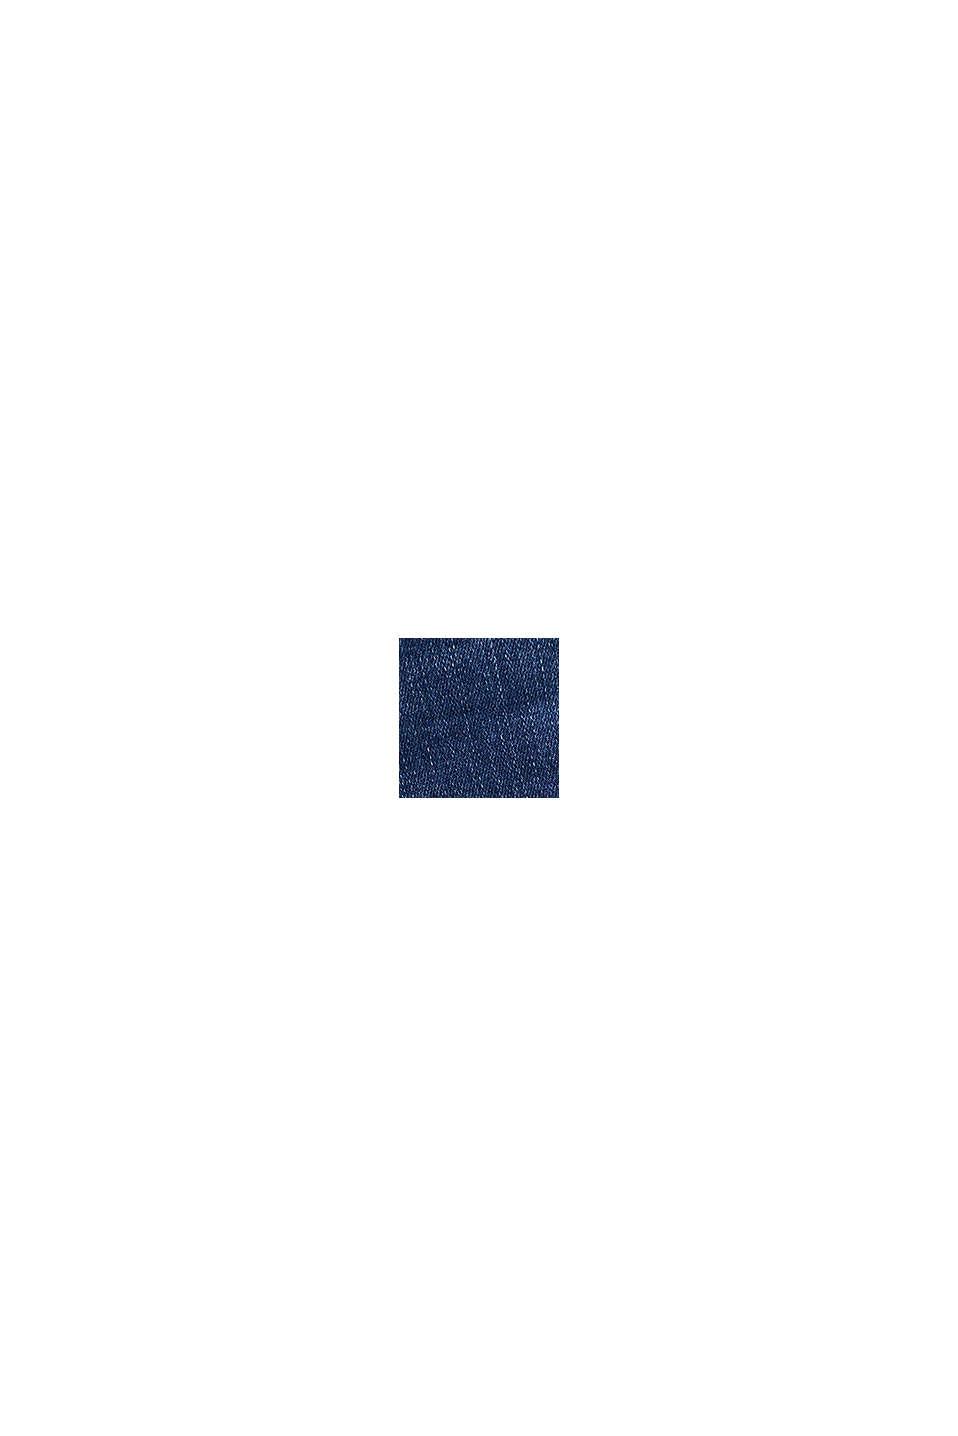 REPREVE Stretchfarkut kierrätettyä polyesteriä, BLUE MEDIUM WASHED, swatch